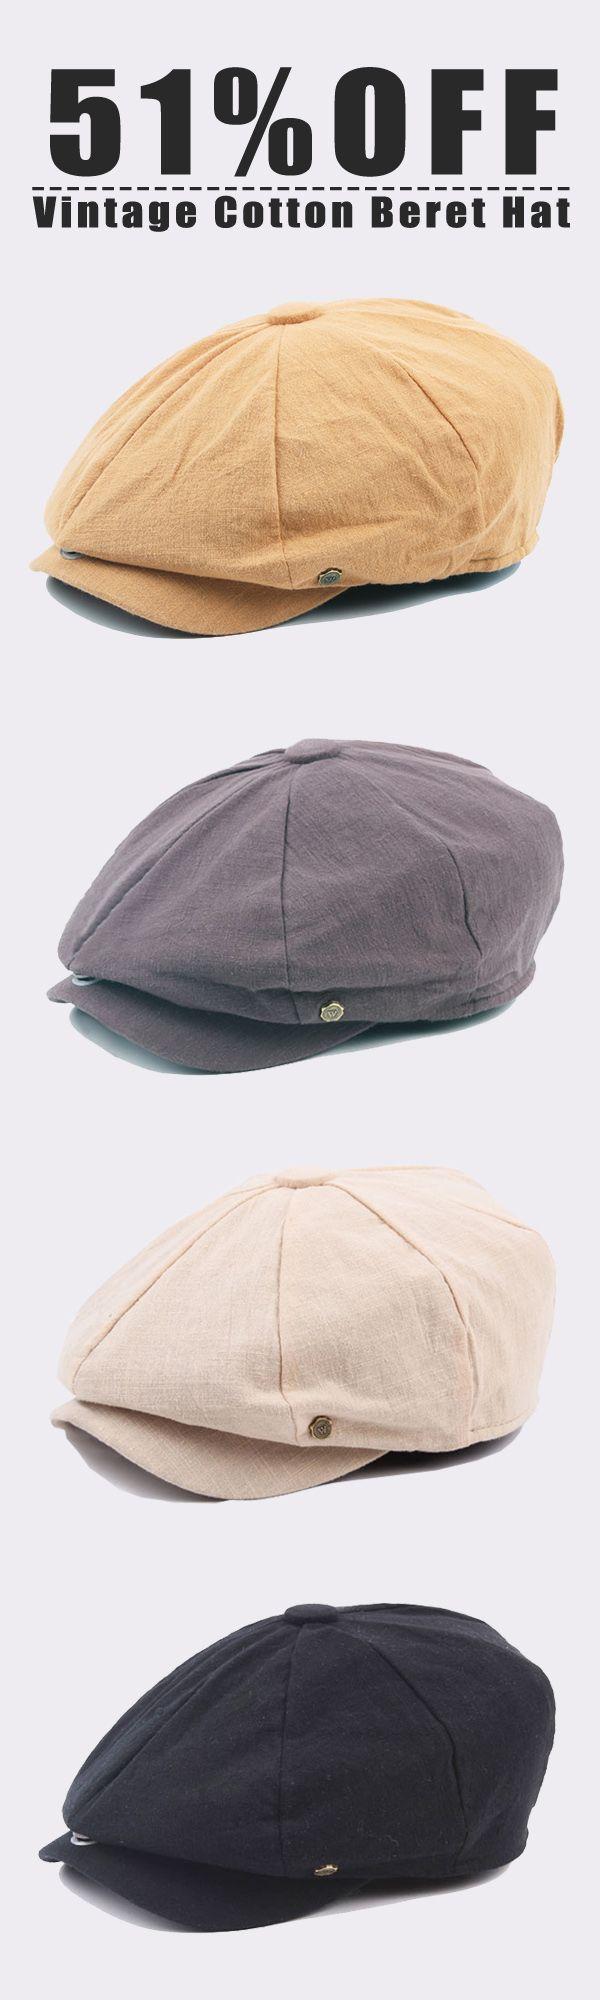 51%OFF&Free shipping. Men's Cap, Vintage Cotton Beret Hats, Casual Solid Color Painter Forward Caps. Color:Dark Grey, Light Grey, Orange, Black, Beige, Navy. Shop now~